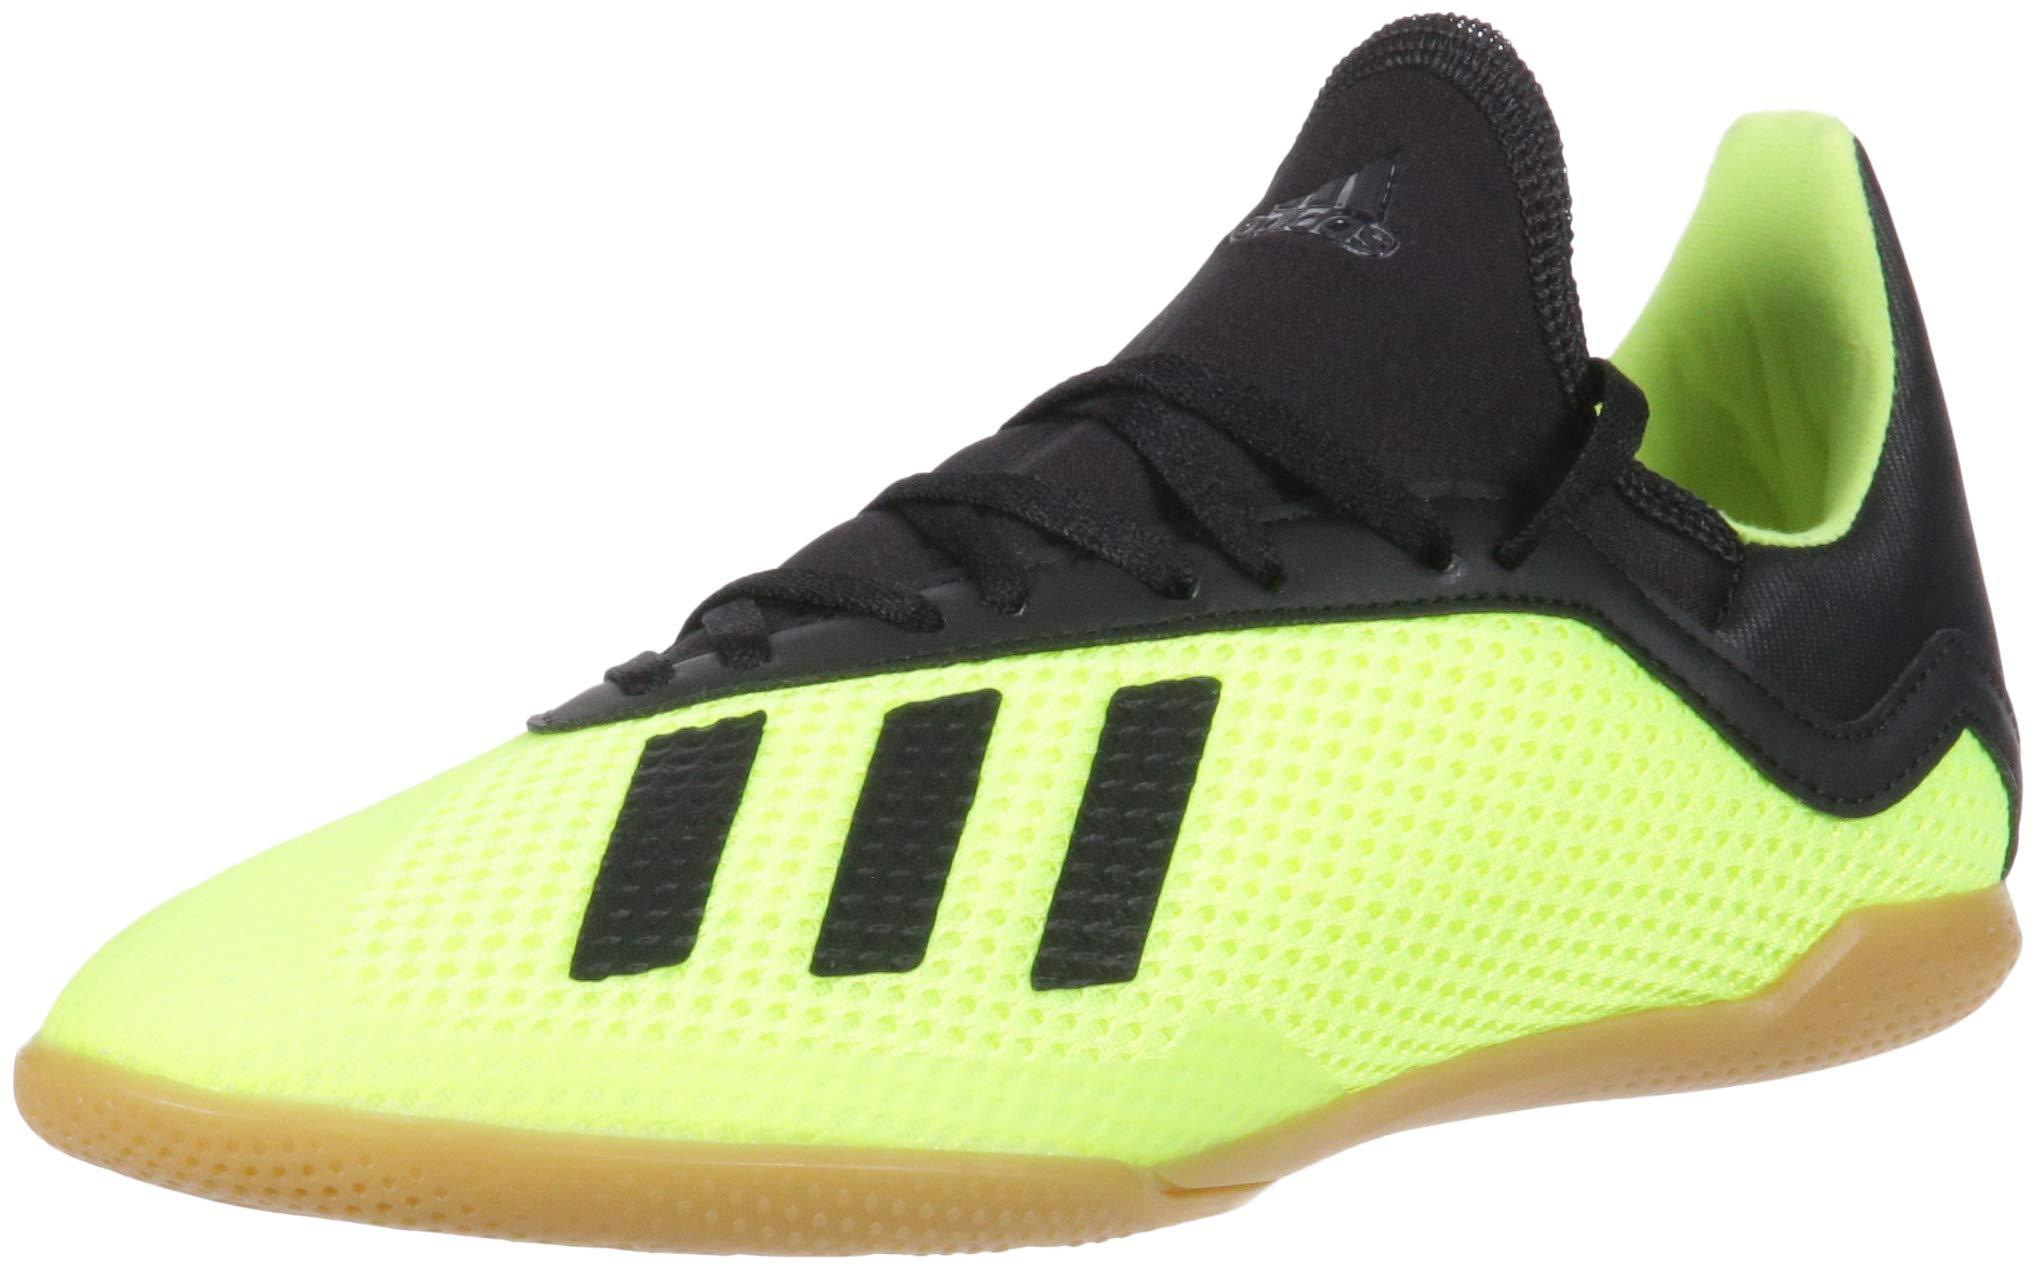 adidas Unisex X Tango 18.3 Indoor Soccer Shoe Black/Solar Yellow, 2 M US Little Kid